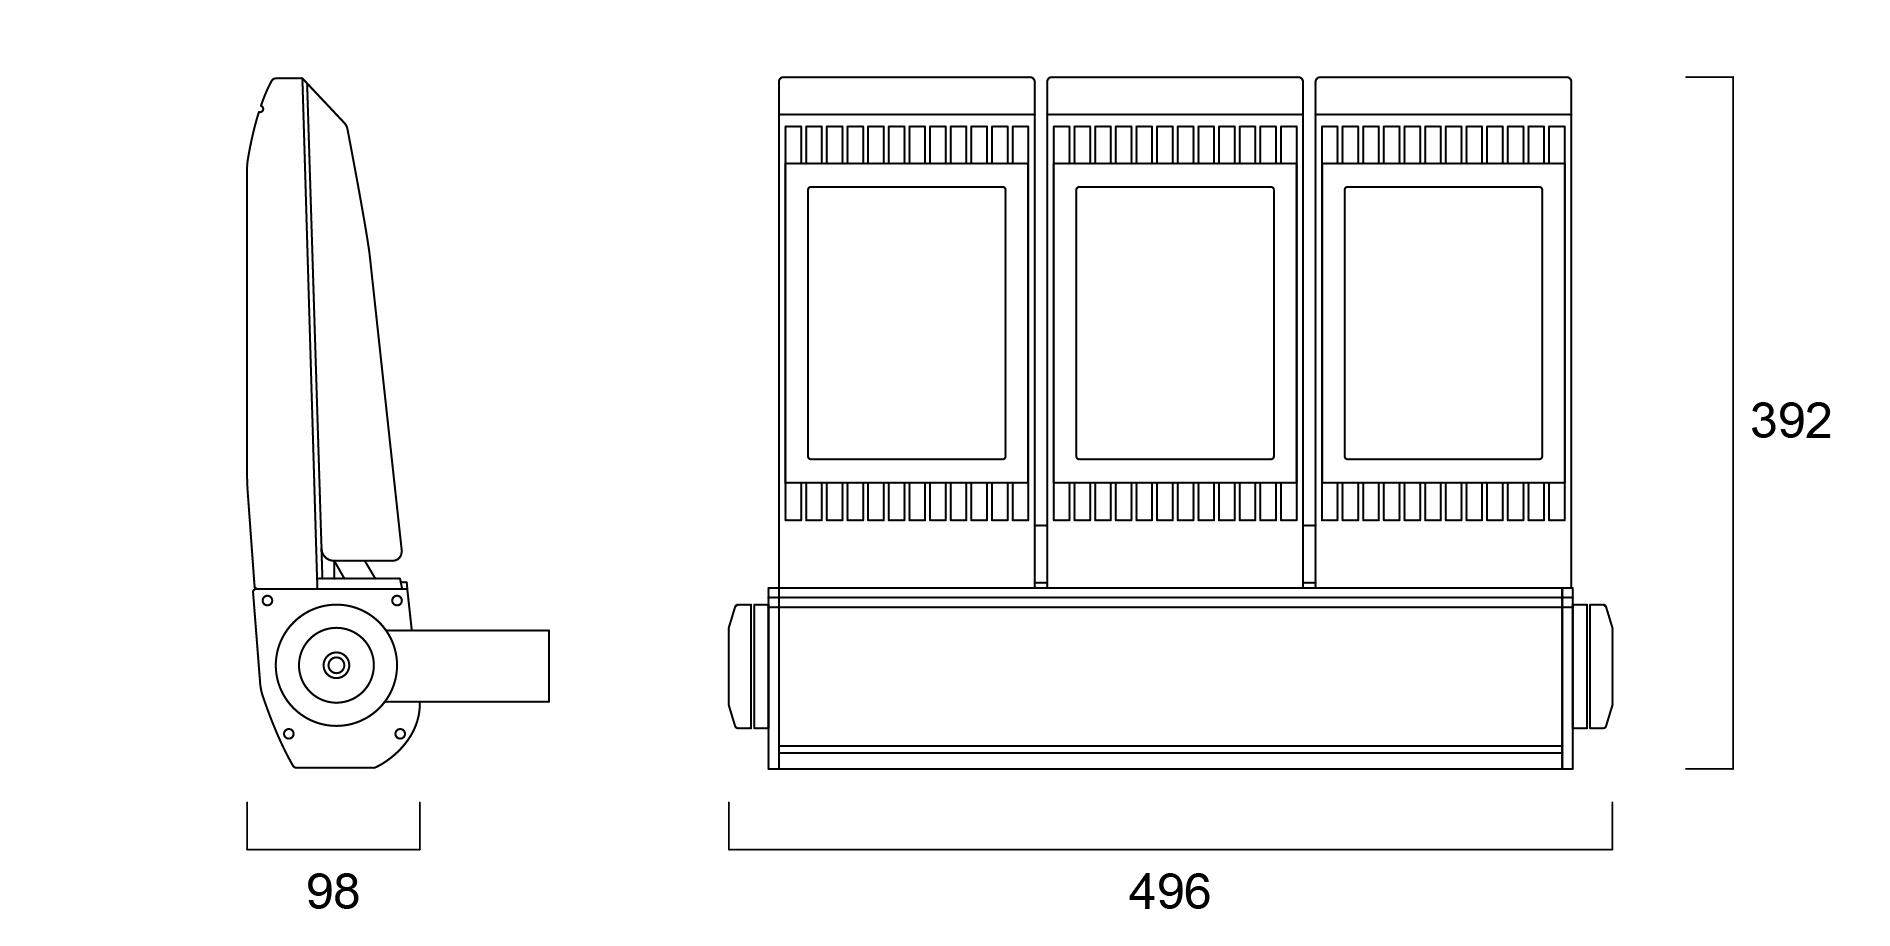 http://v2.static.sylvania-lighting.online/Hybris_V2/0049118/Technical_Drawings/EN/sylveo_20000lm_line_drawing.jpg